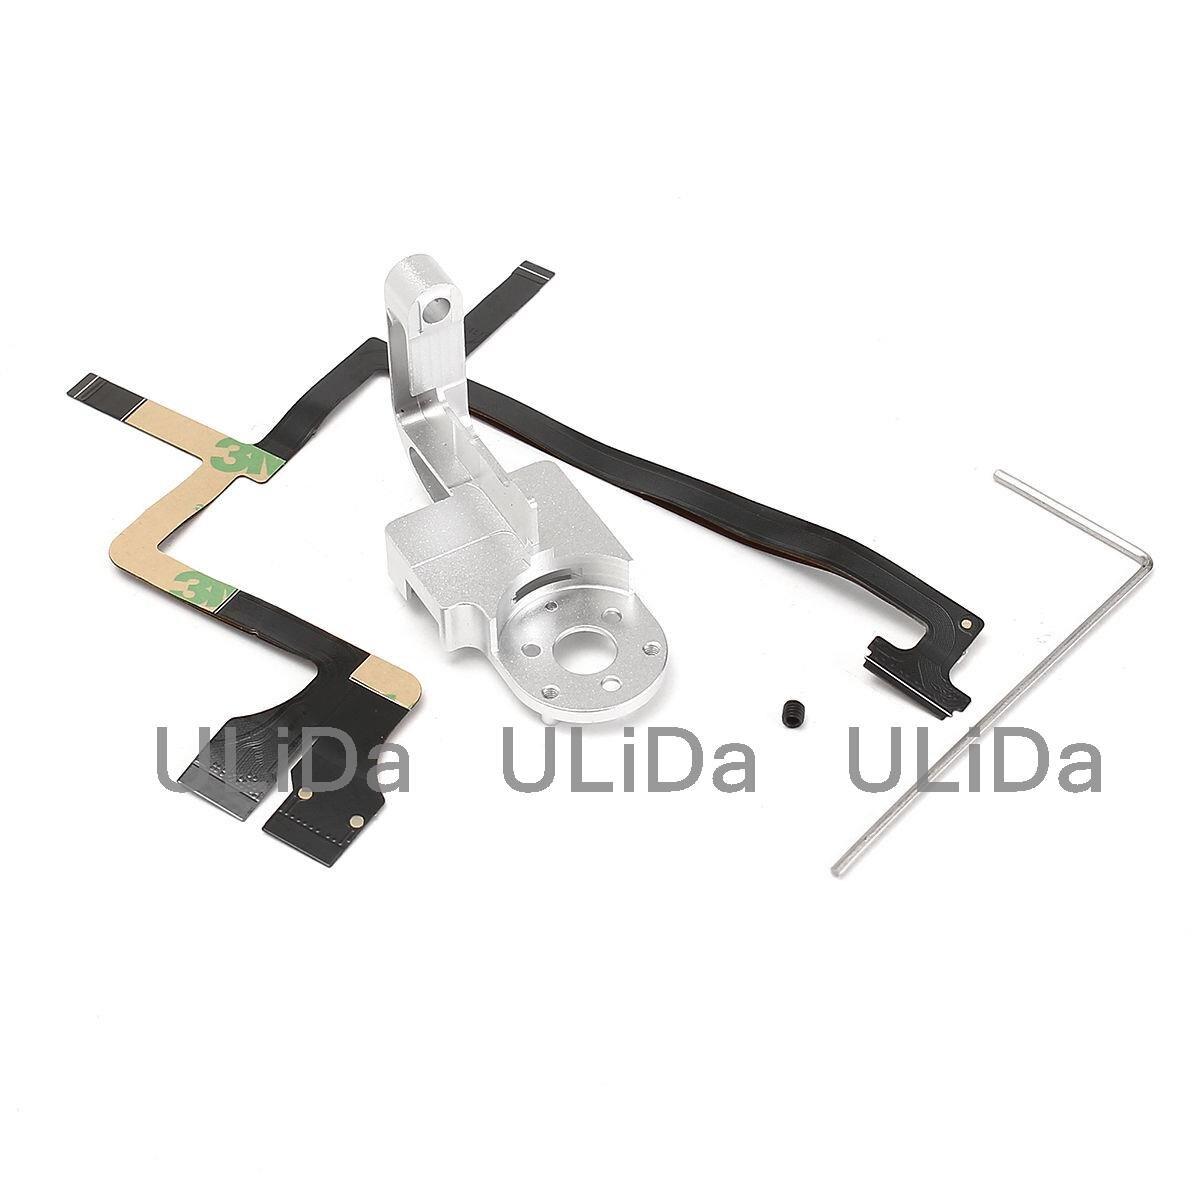 DJI Phantom 3 Professional/Advanced Gimbal Yaw Arm +Ribbon Cable kit + screw